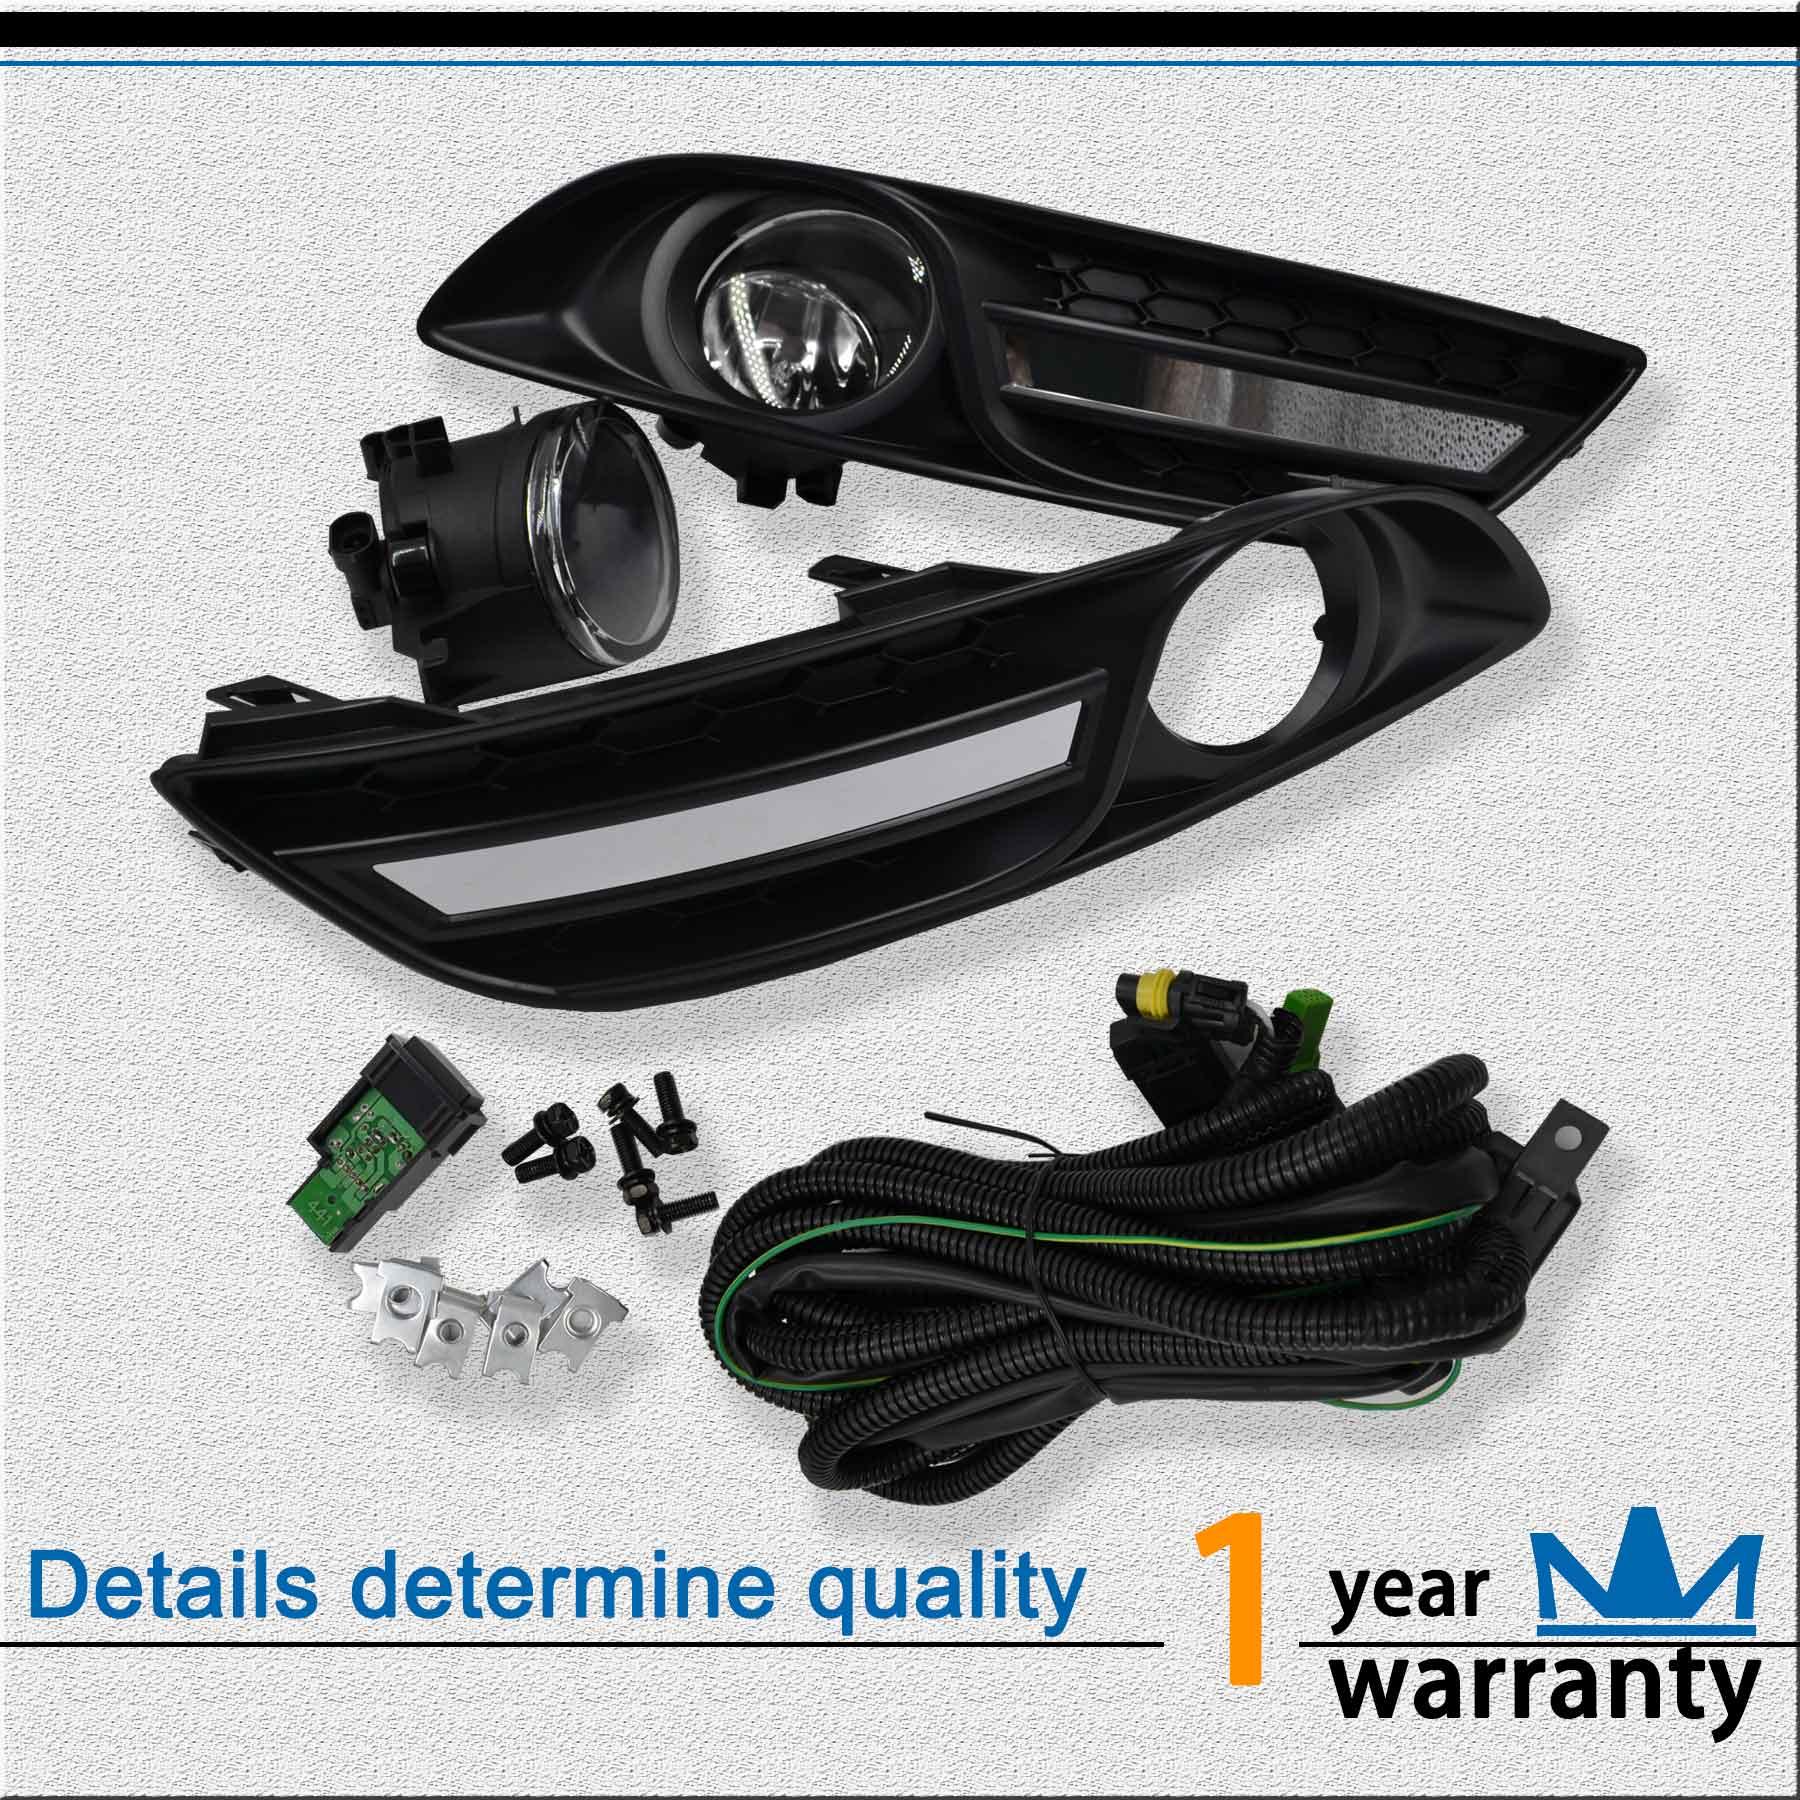 * 00-06 BMW X5 E53 CHROME Rear Trunk Boot Lid Trim Cover